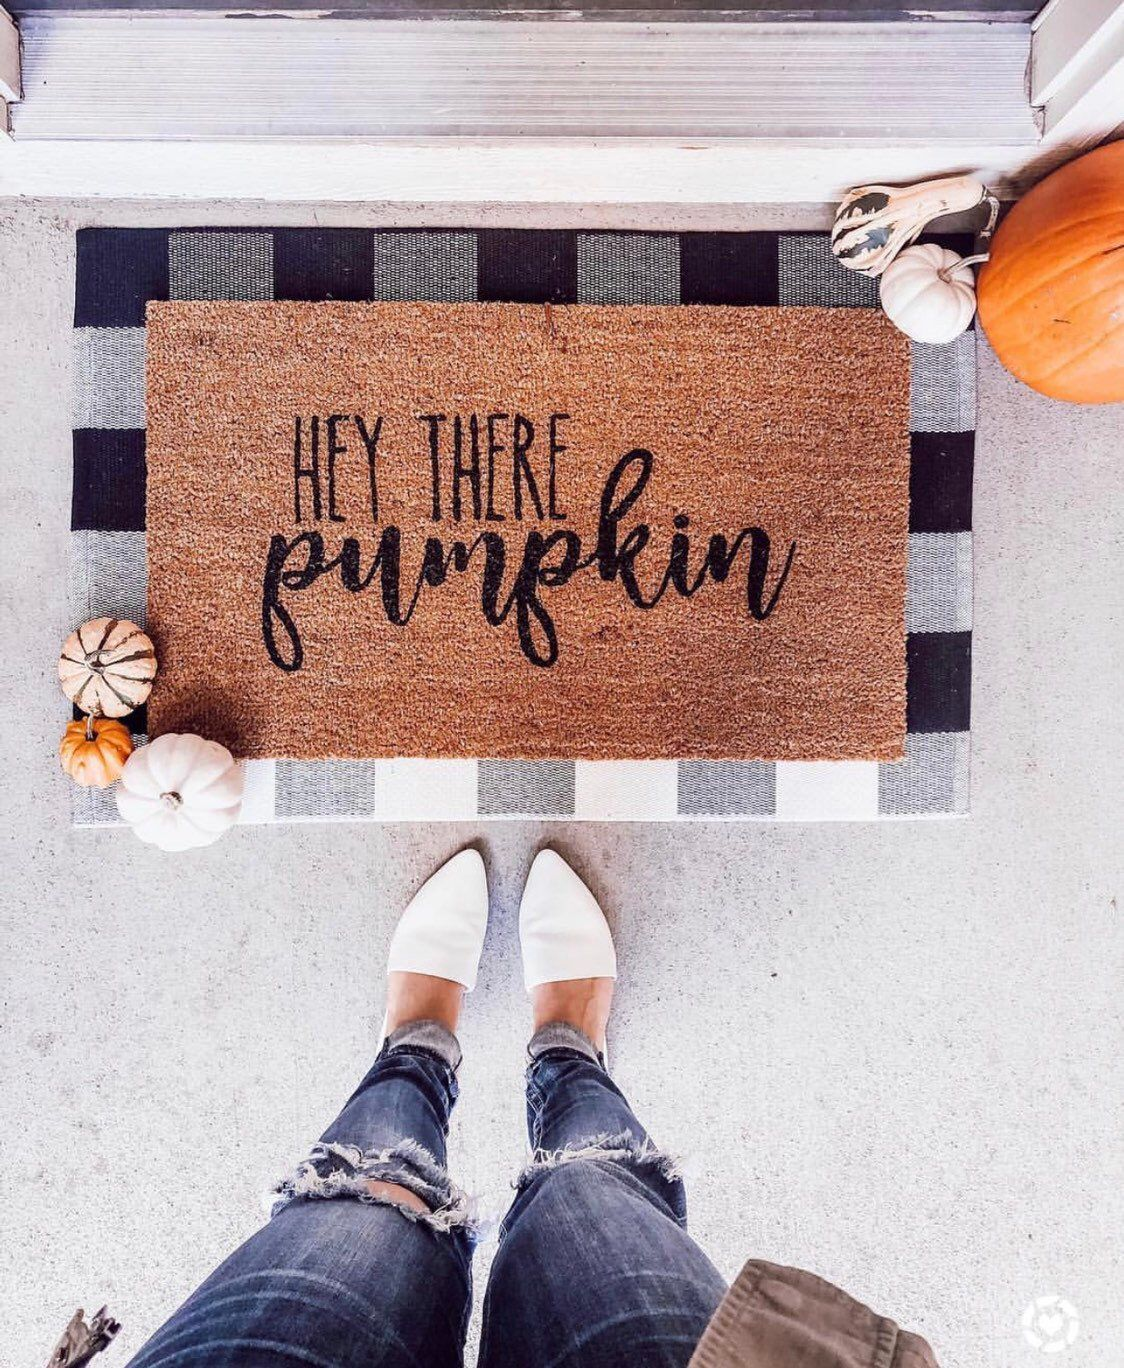 #Closing #Decor #door #Doormat #front #funny #Gift #Hey #MAT #Porch #Pumpkin #Spring